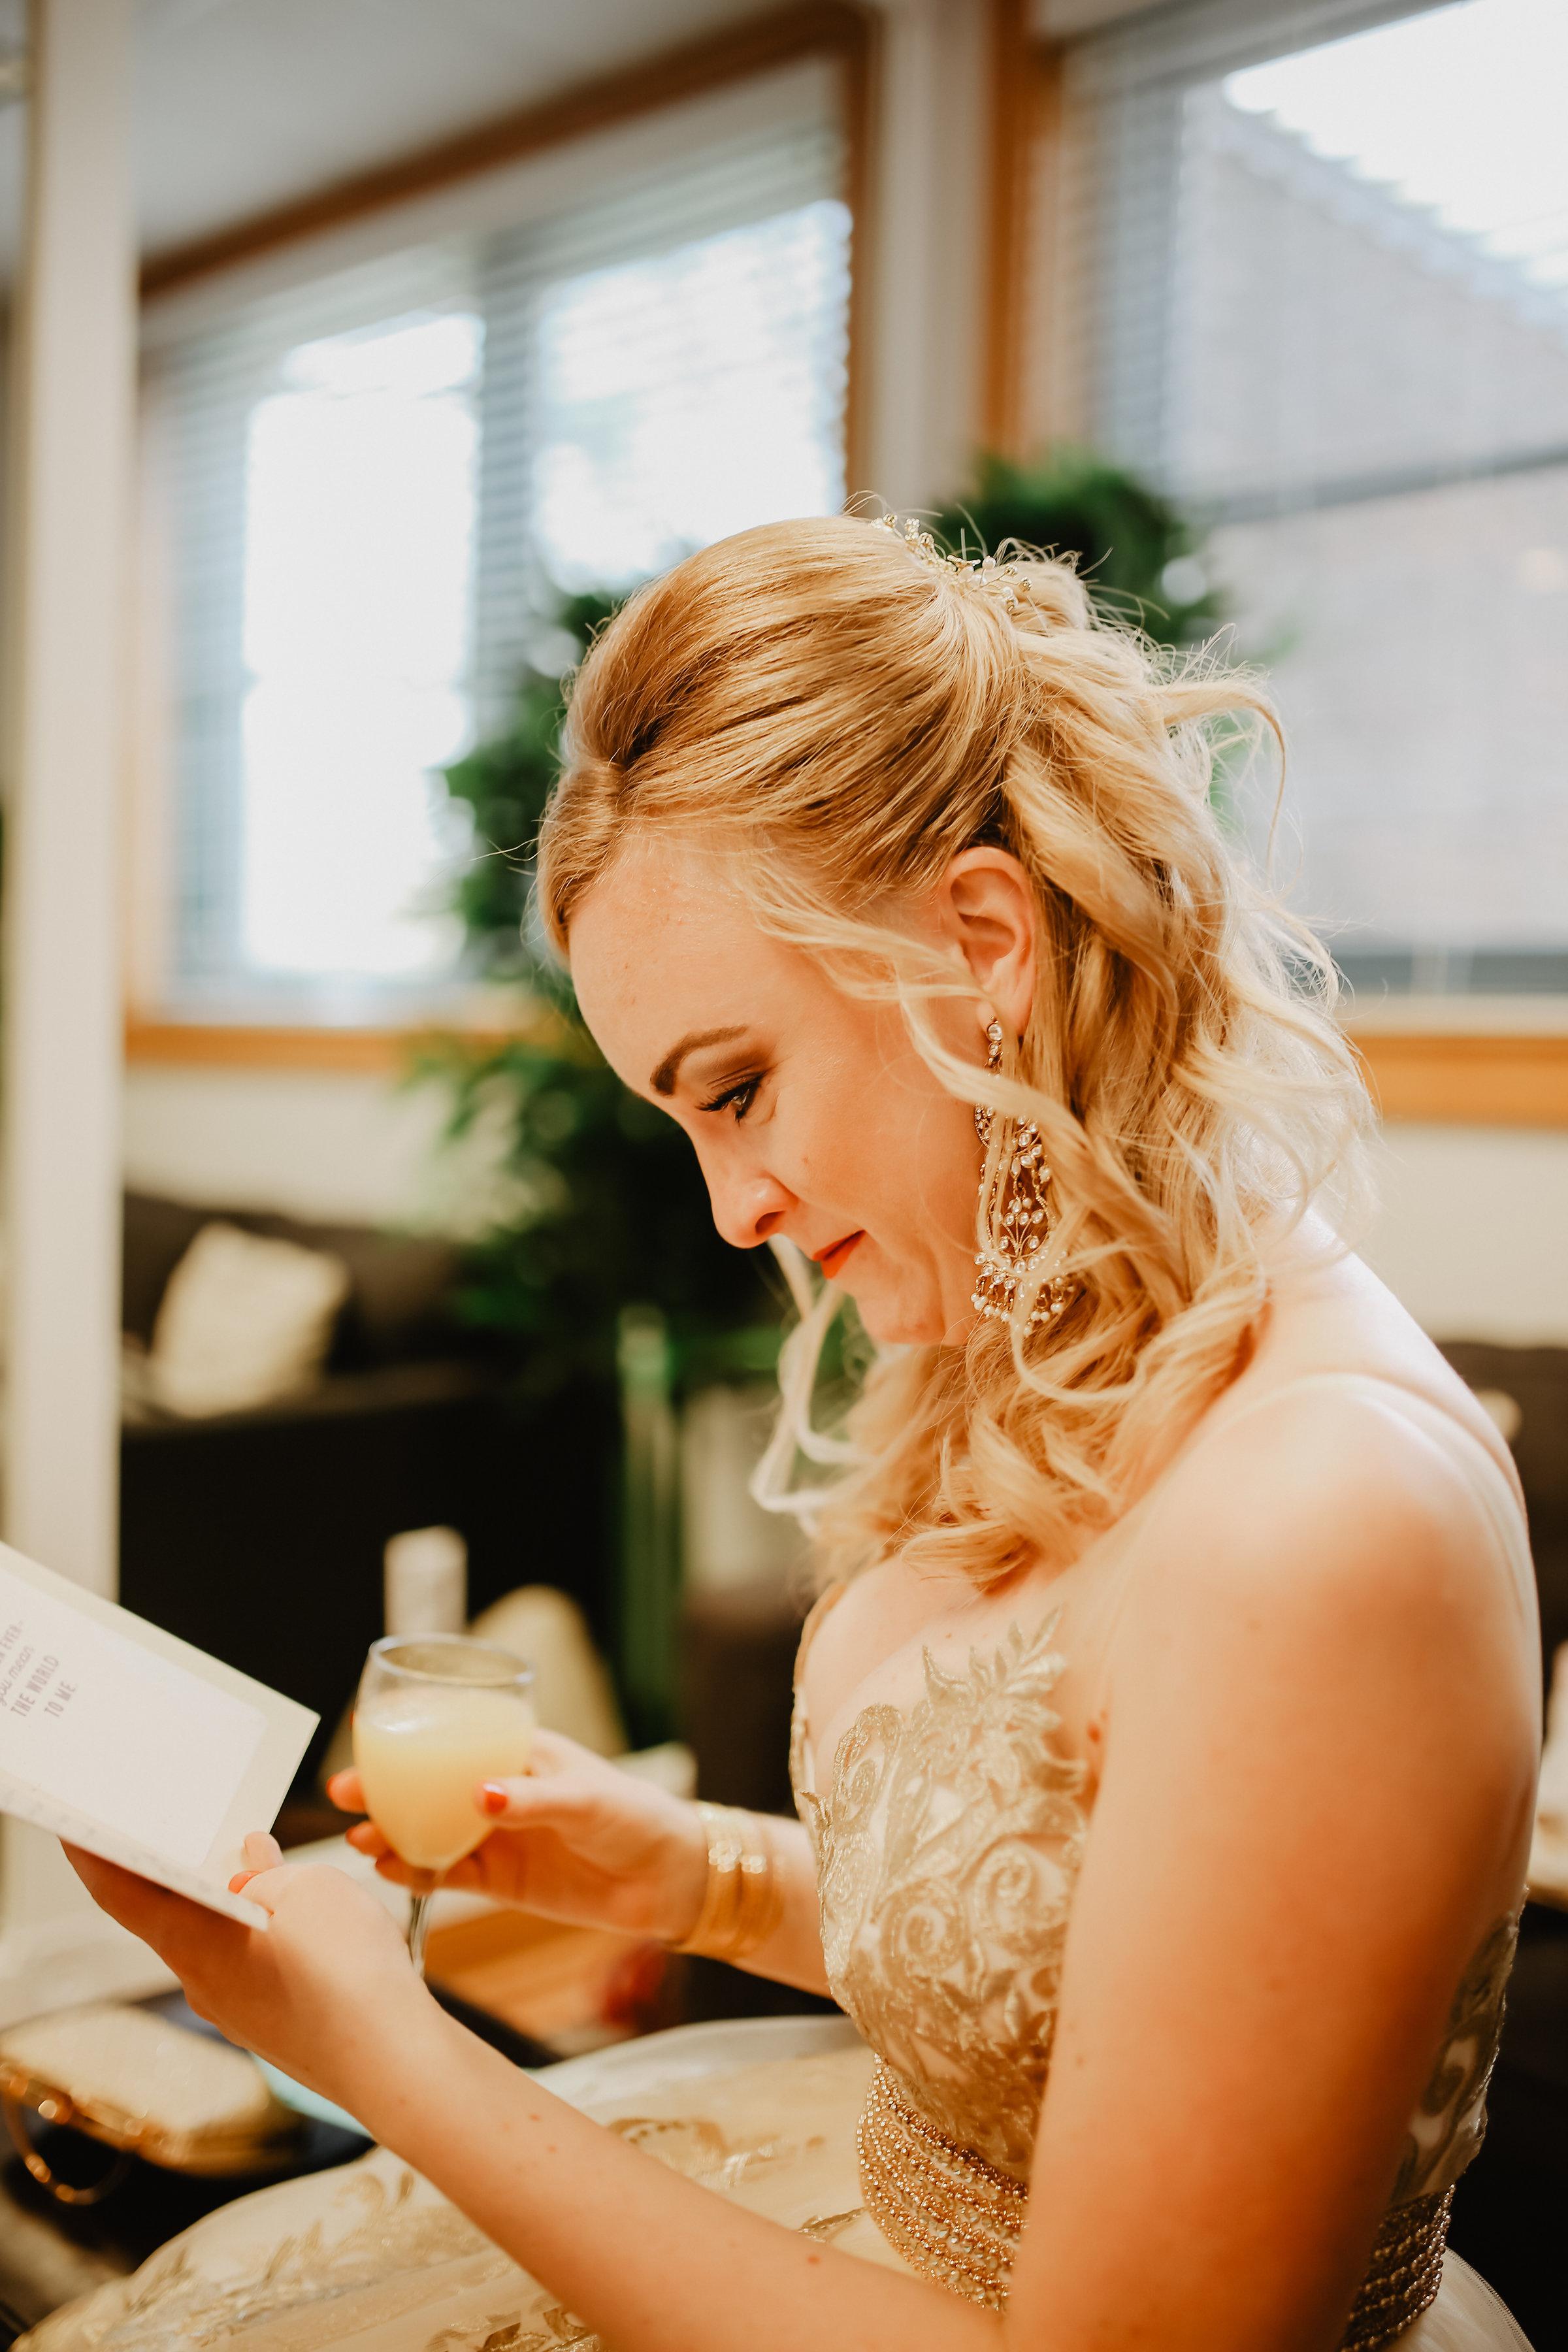 LisaTim_Married_2018-45.jpg